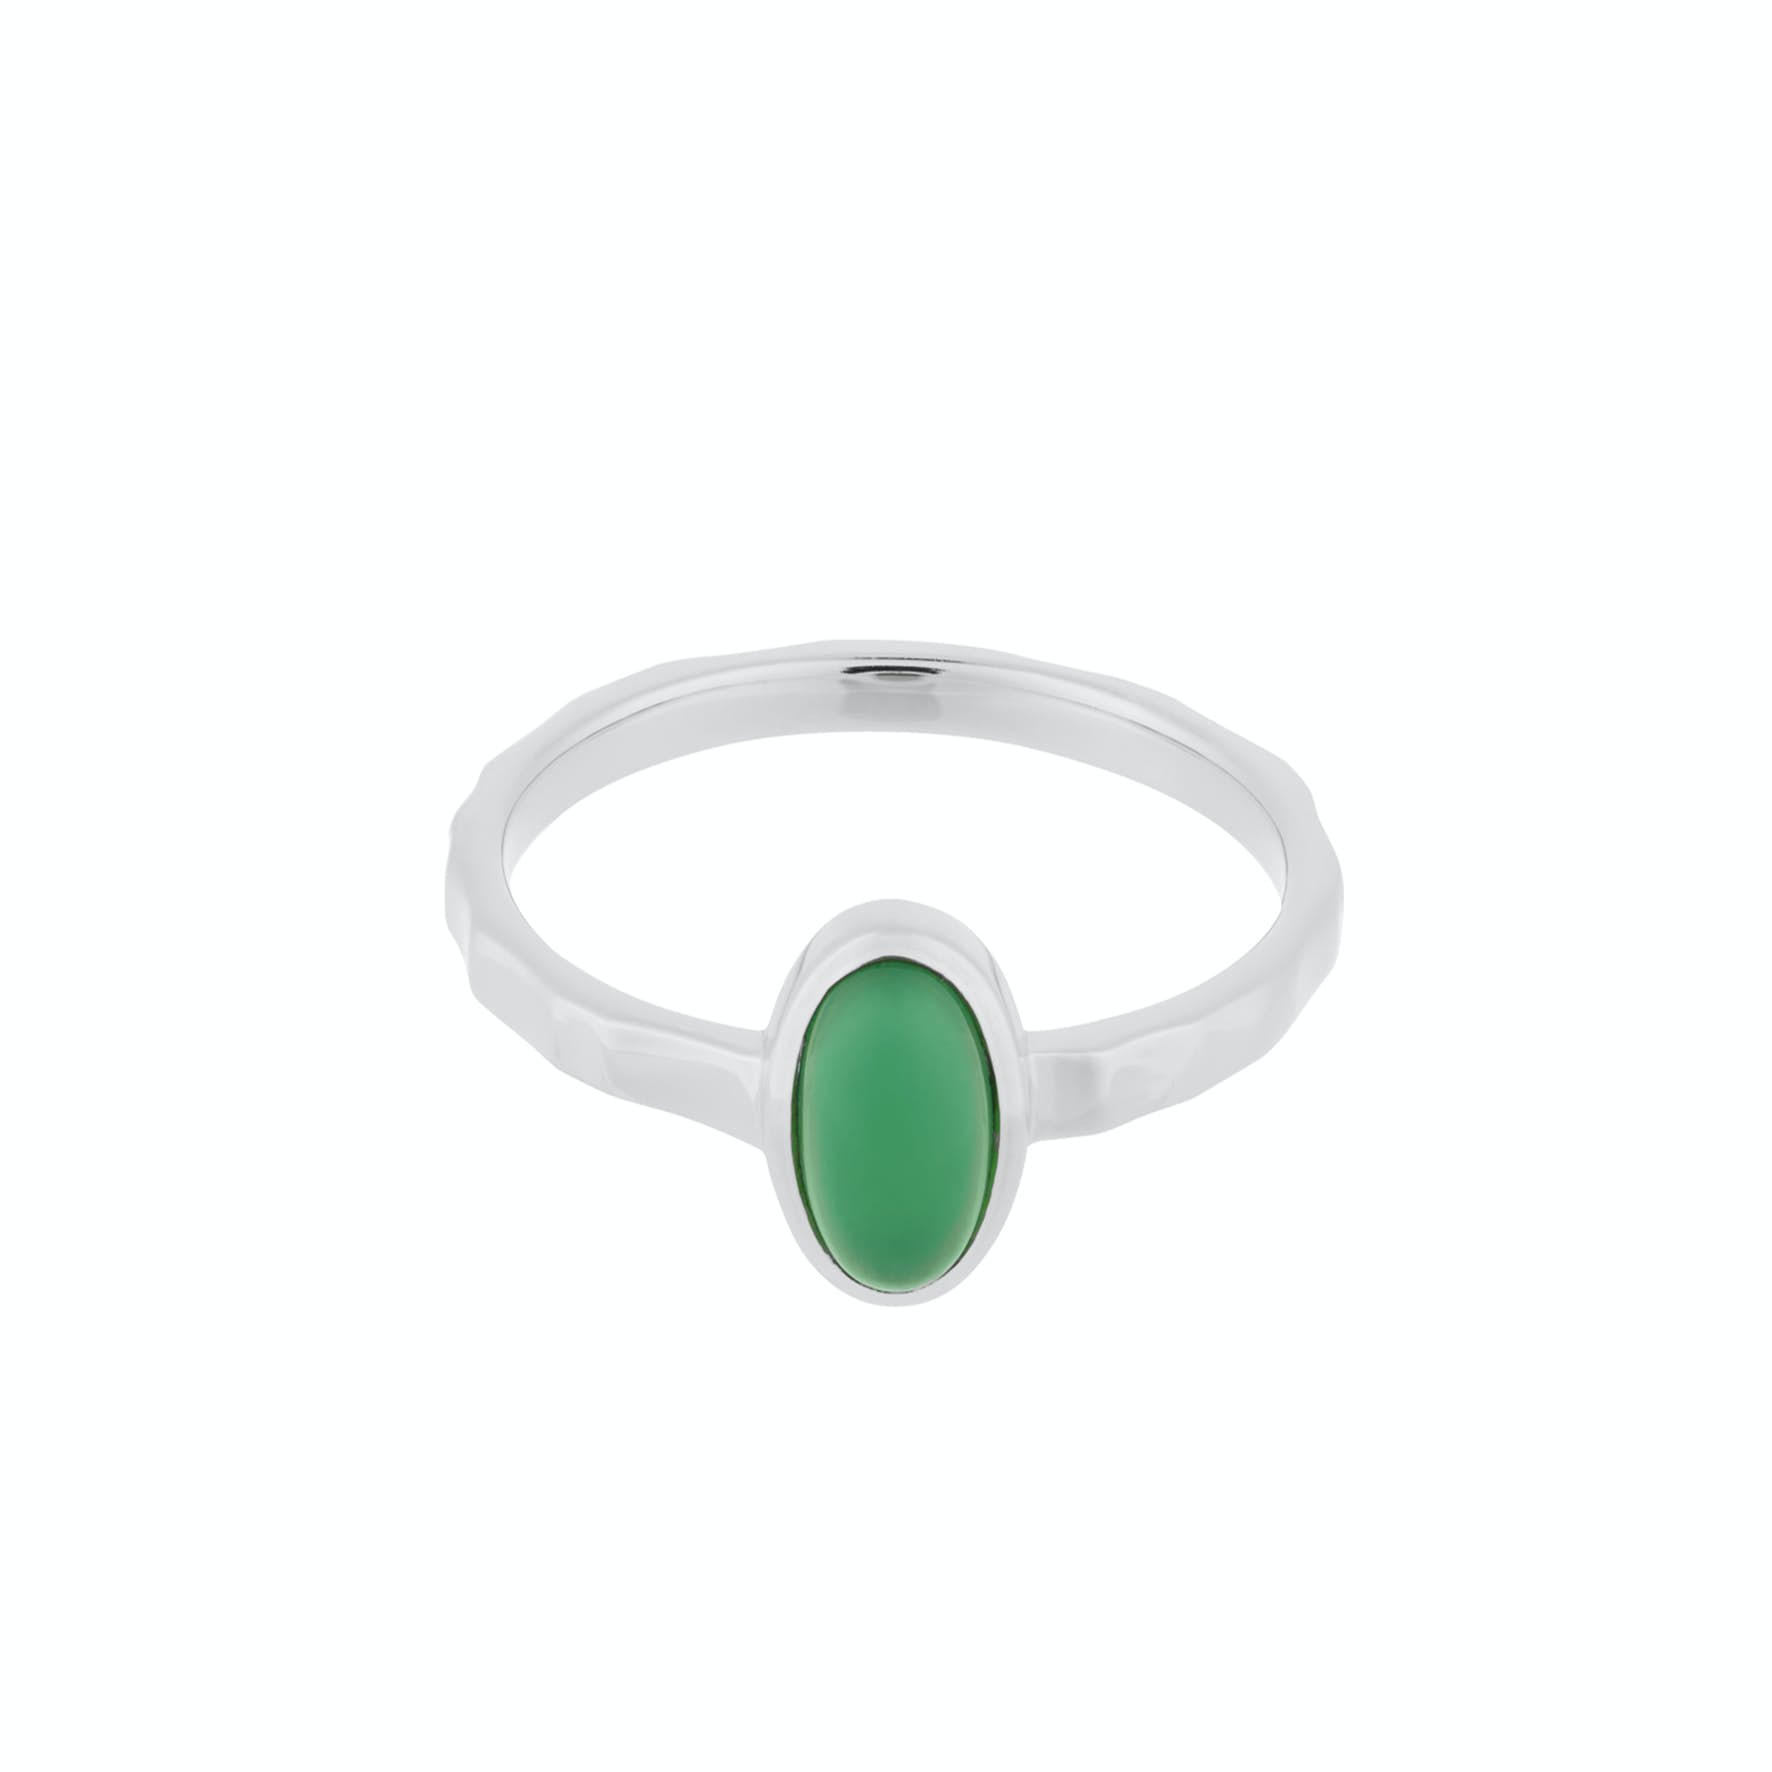 Shine Green Ring von Pernille Corydon in Silber Sterling 925